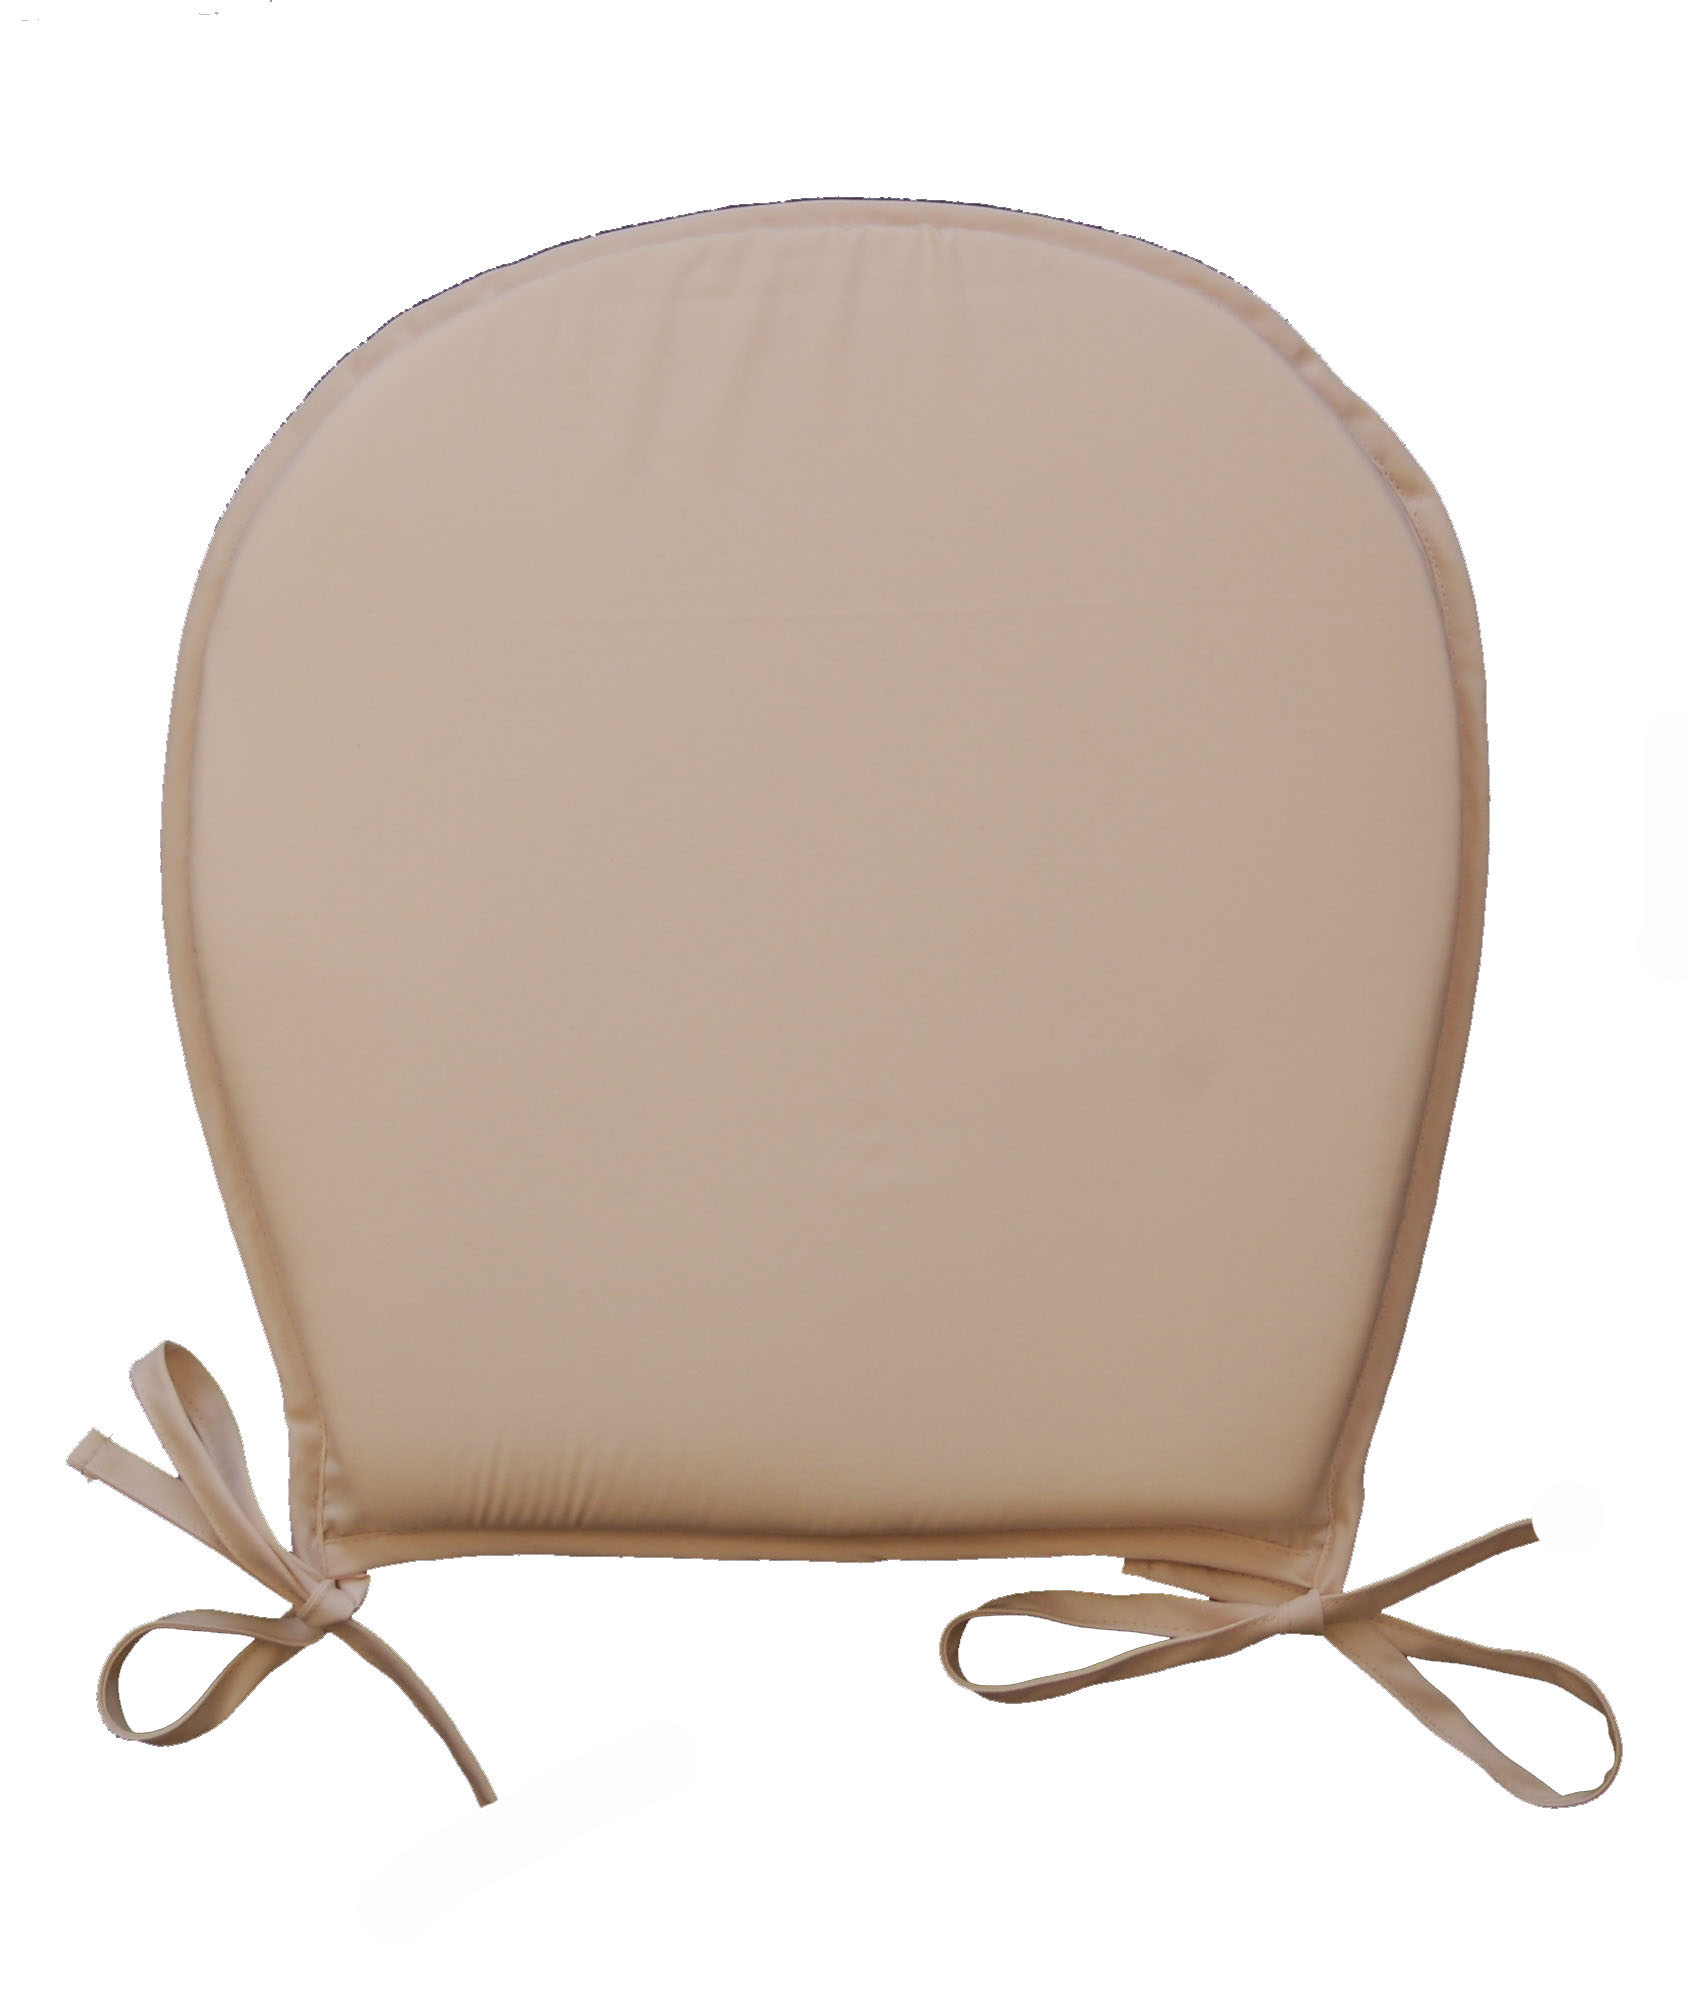 kitchen chair cushions kitchen chair cushions kitchen chair cushions photo 7